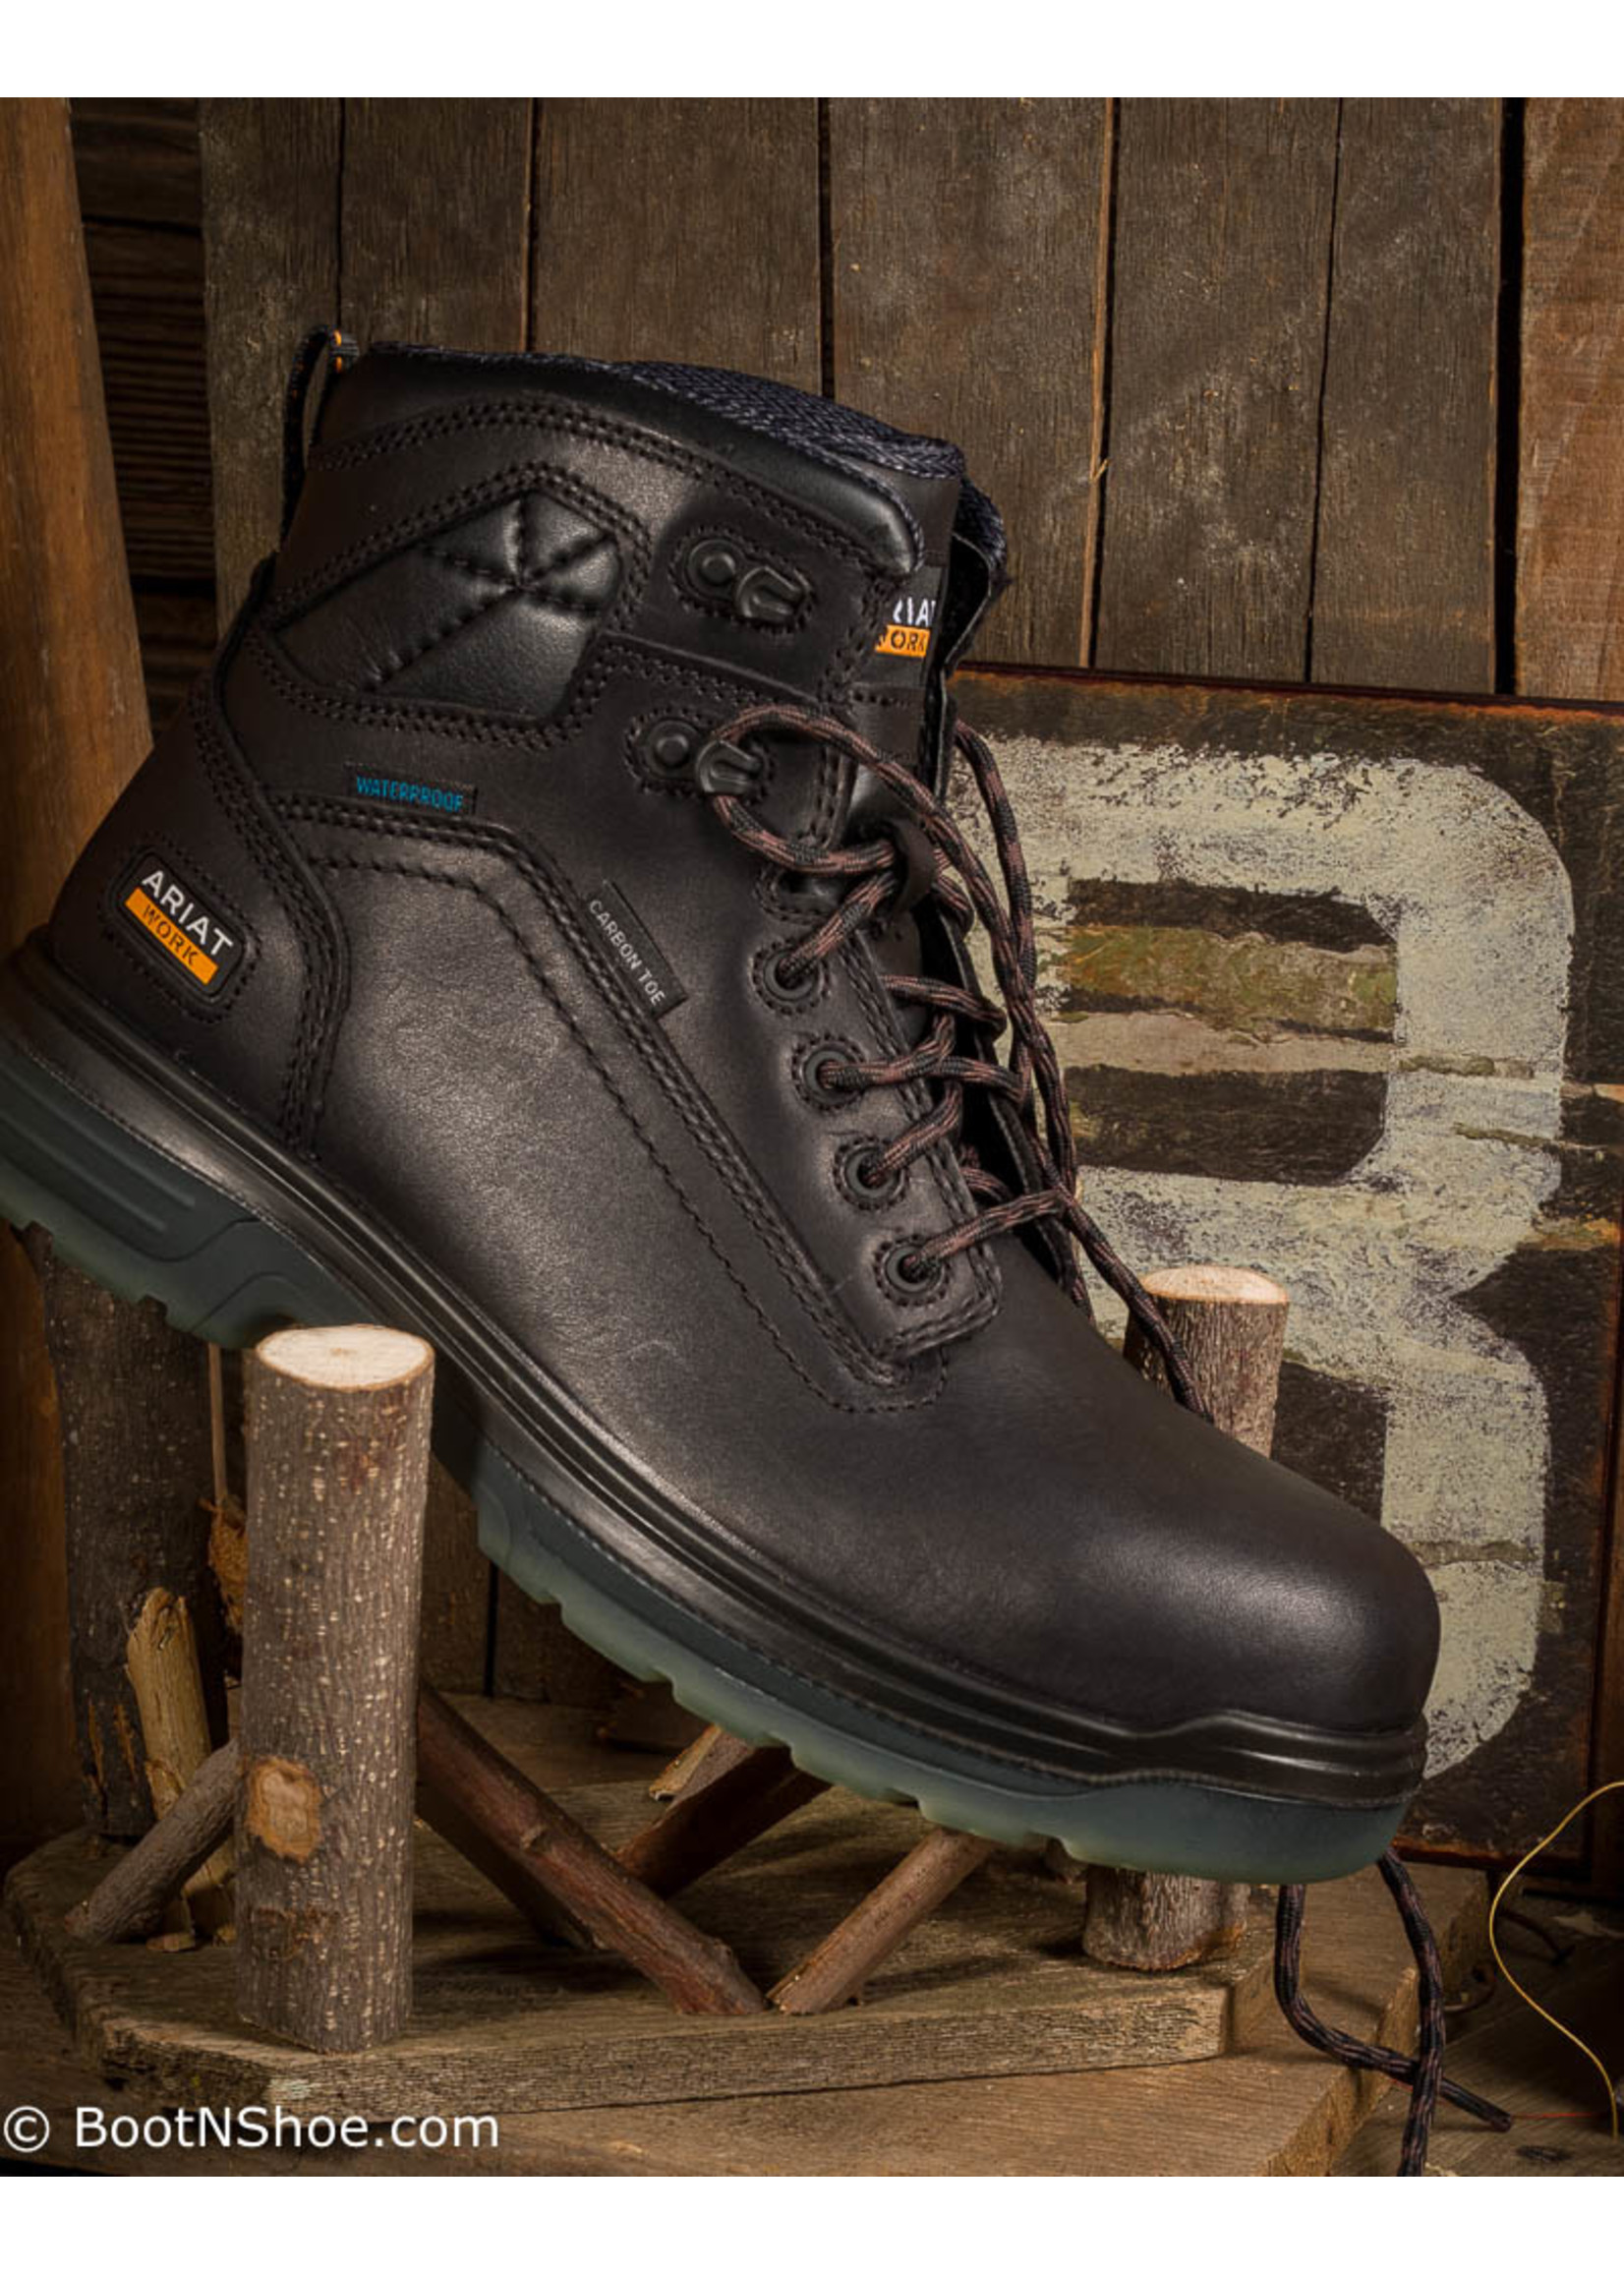 Ariat Men's Composite Toe Lace-up Black Waterproof Work Boots 10027337